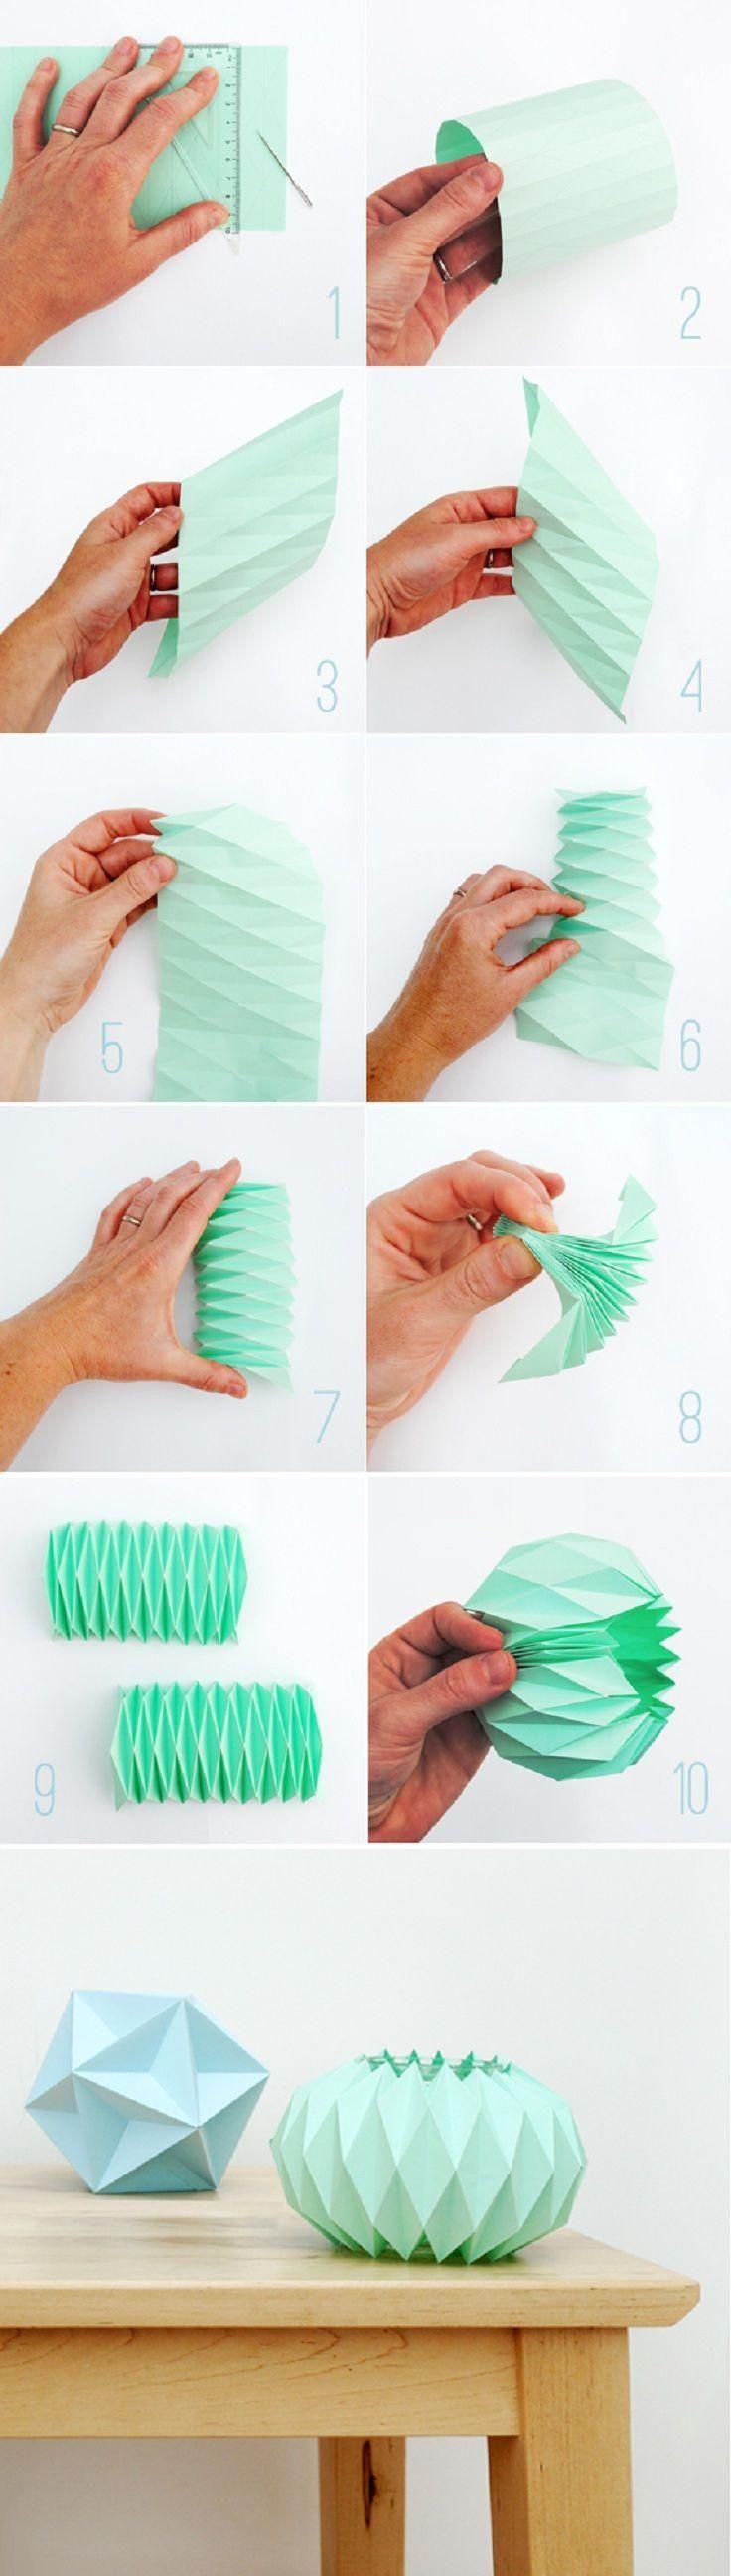 DIY Accordion Paper Folding // Candle Holders - Joybx